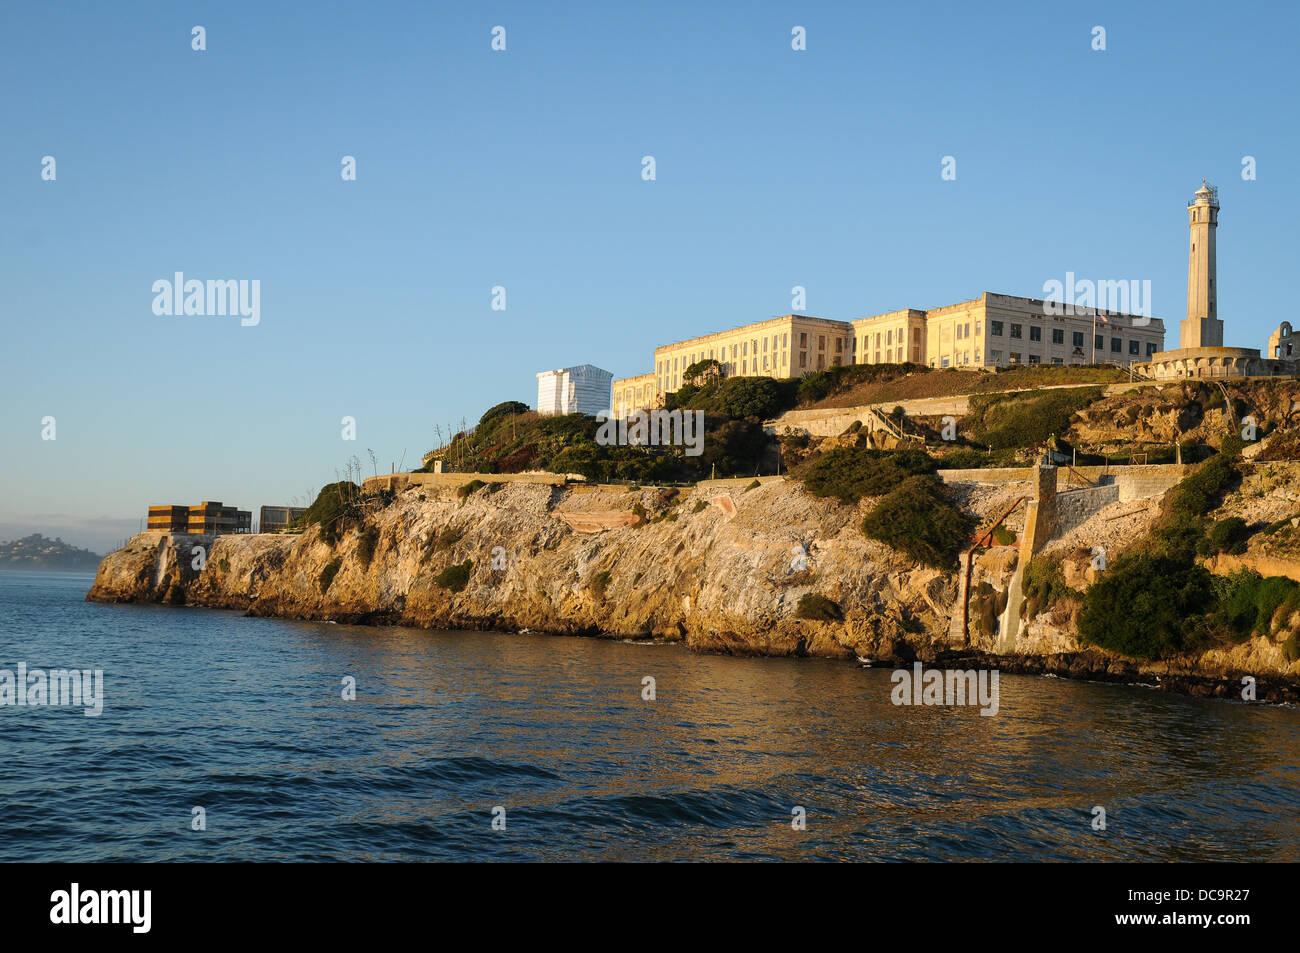 Alcatraz Island in the evening - Stock Image